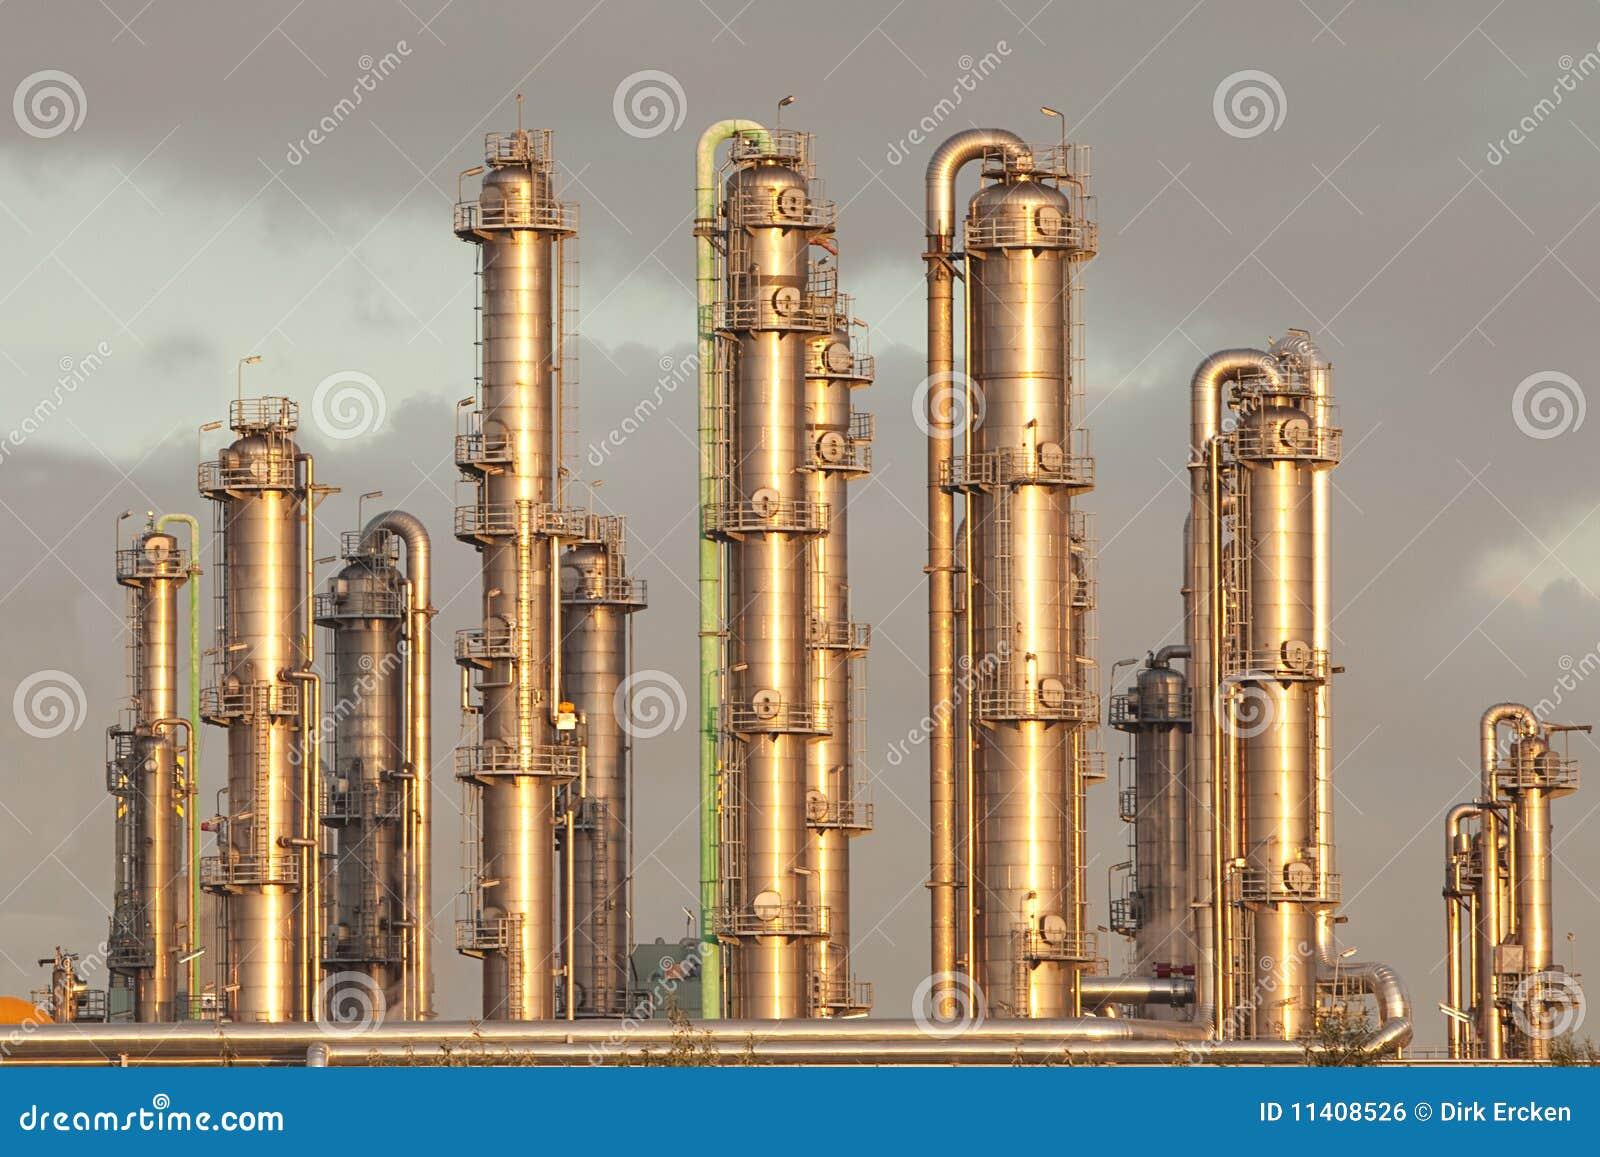 Oil refinery industry distillation pipelines